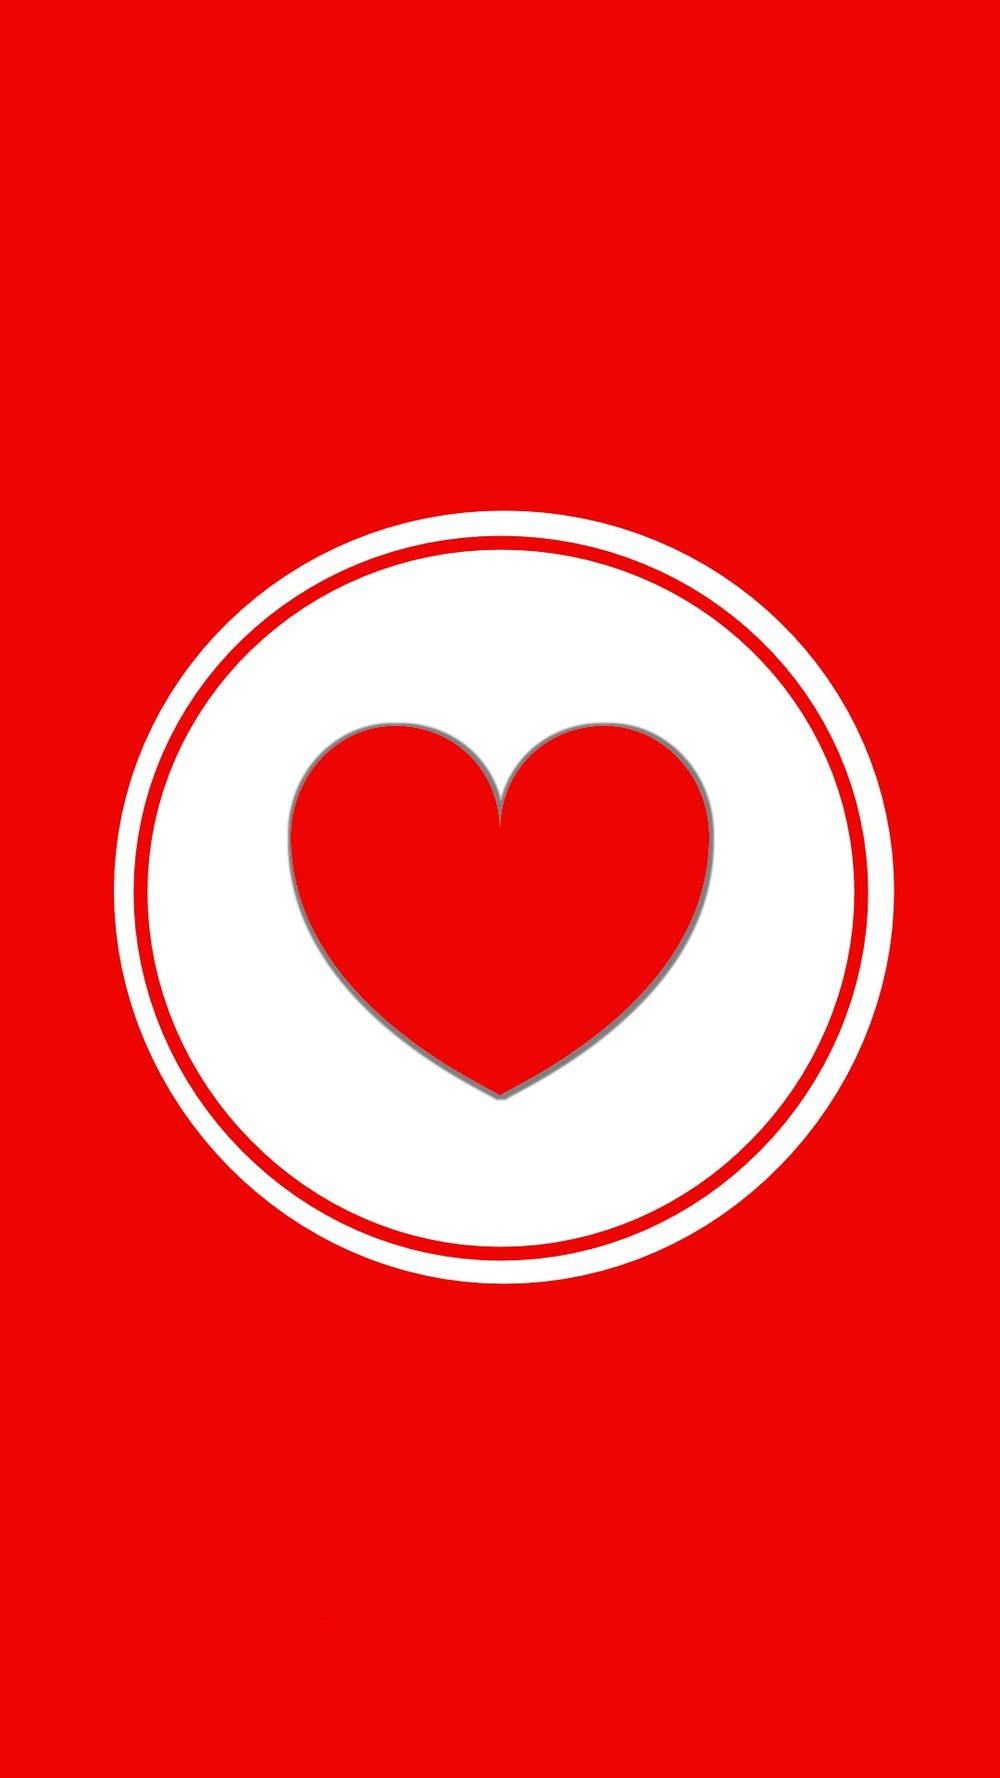 Instagram-cover-heart-red-lotnotes.com.jpg